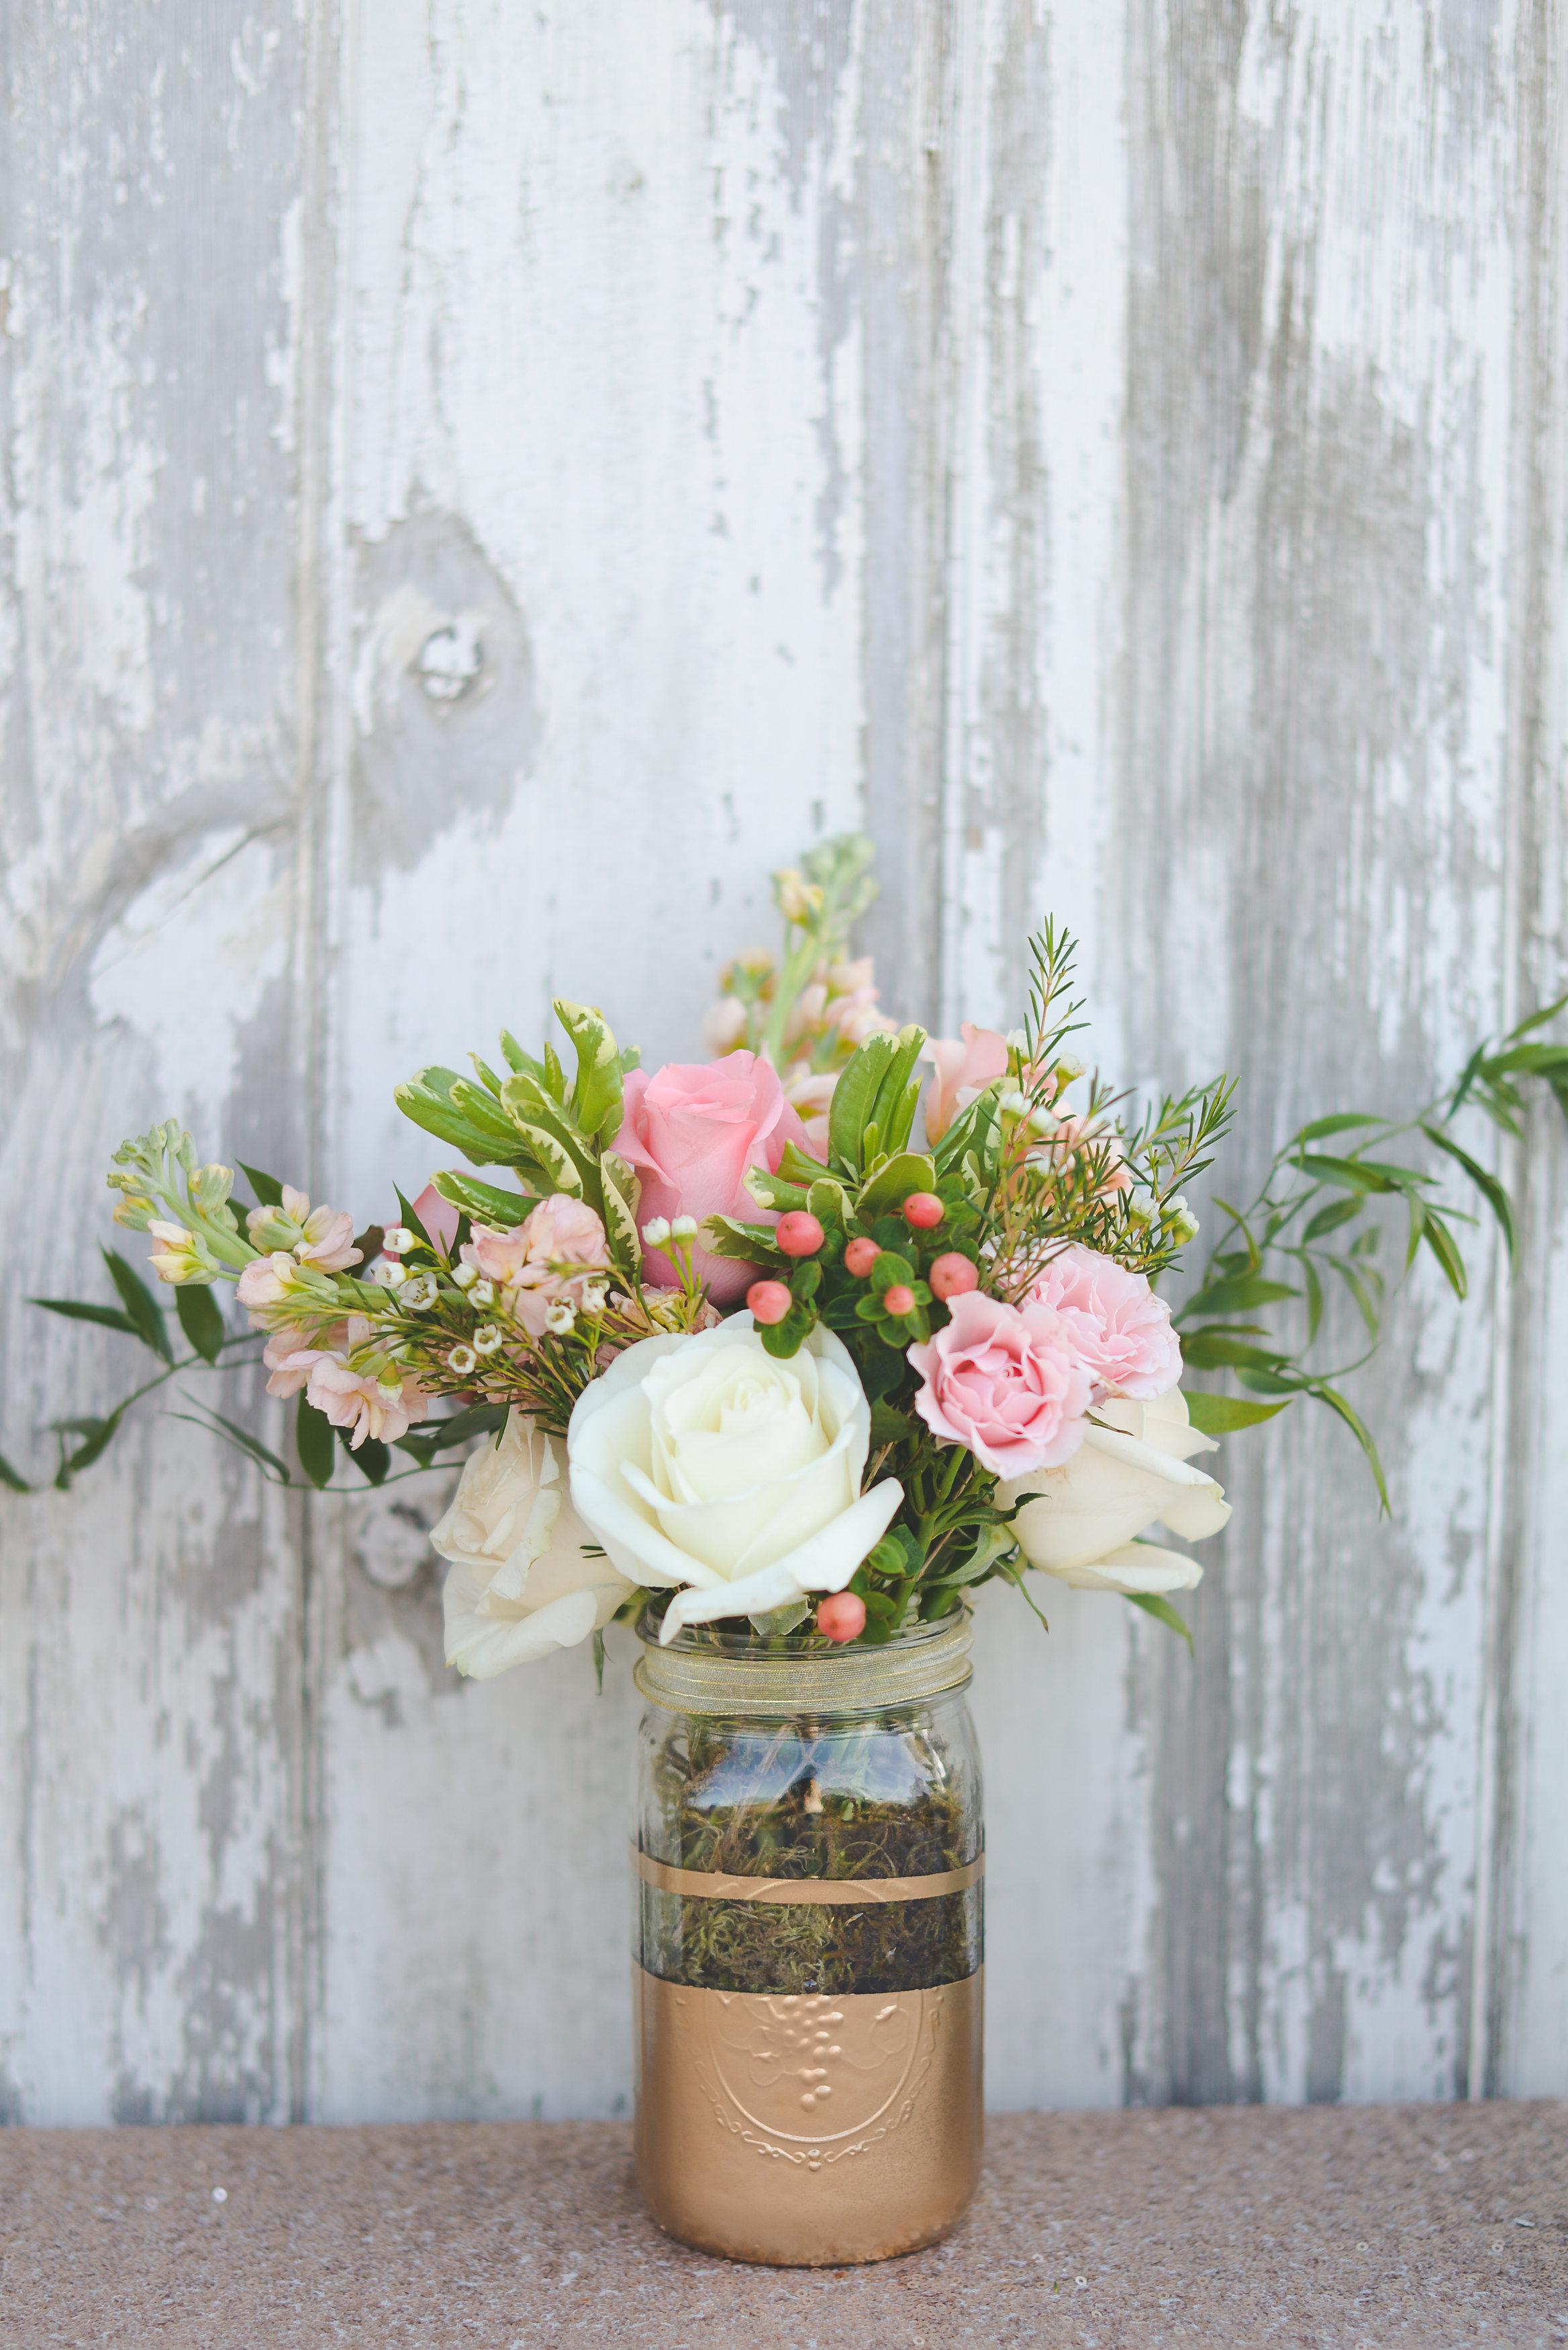 Elegant Rustic Floral Centerpieces – Wedding